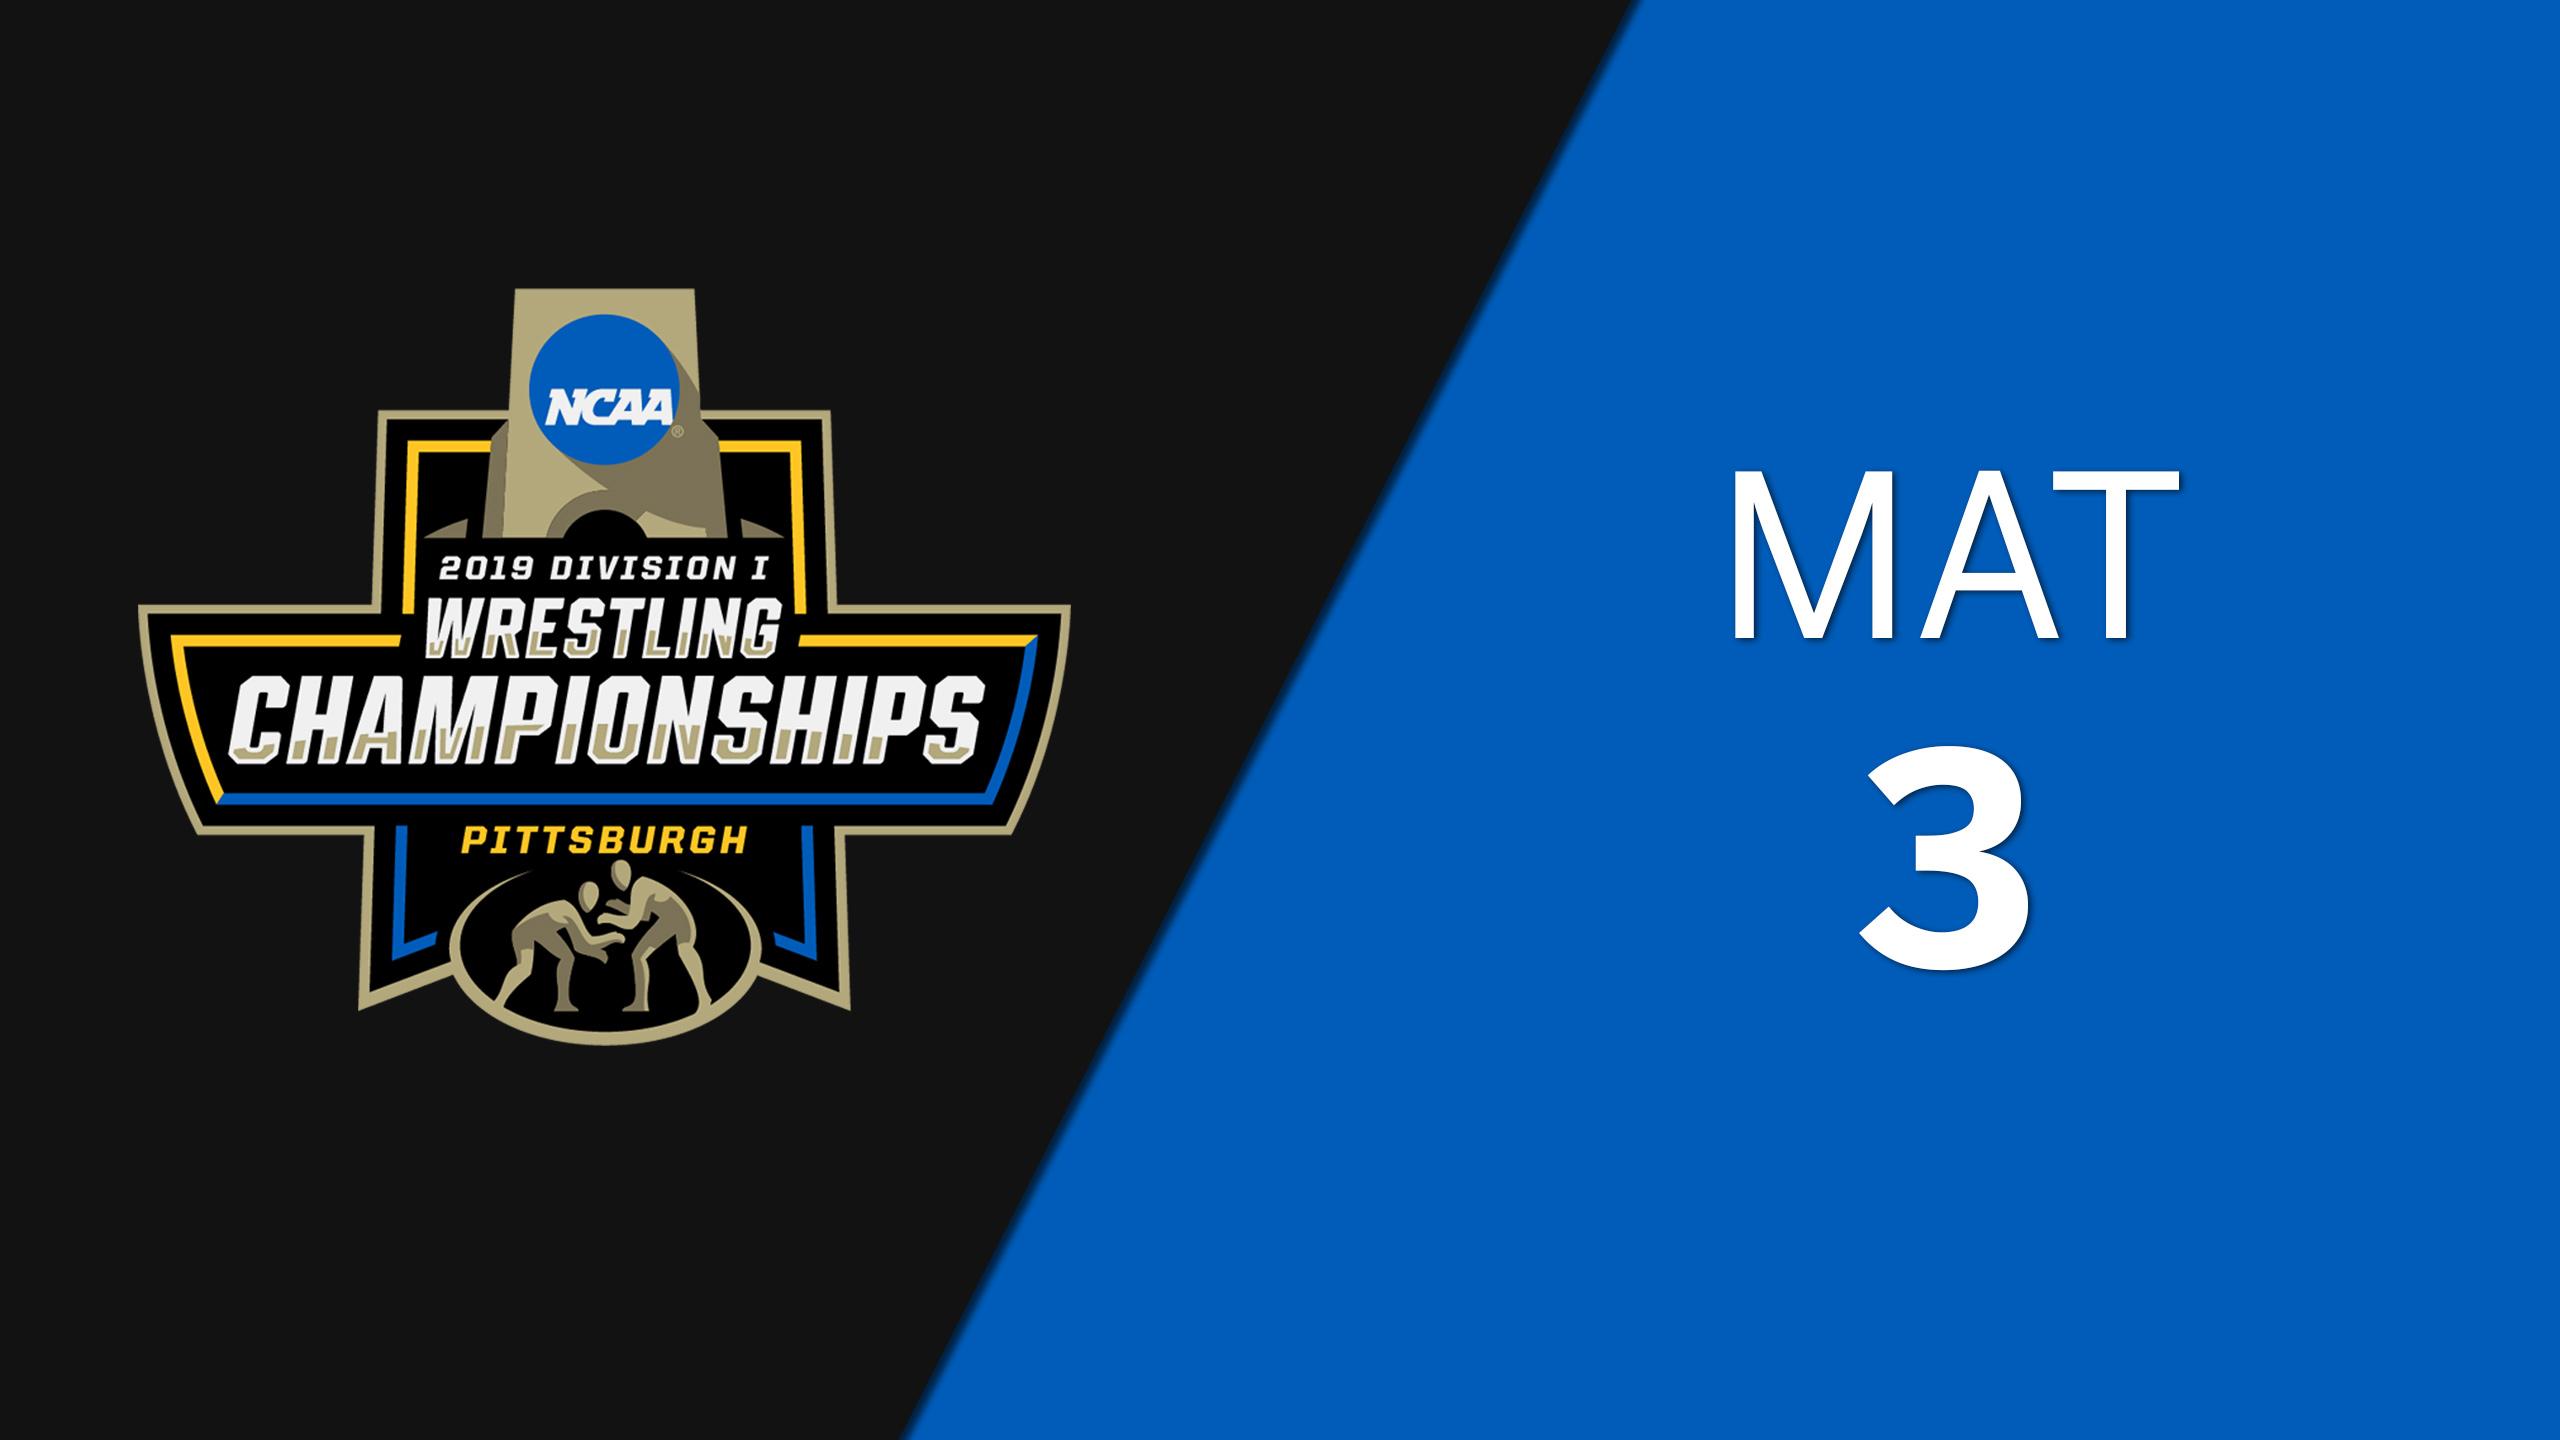 NCAA Wrestling Championship (Mat 3, Second Round)